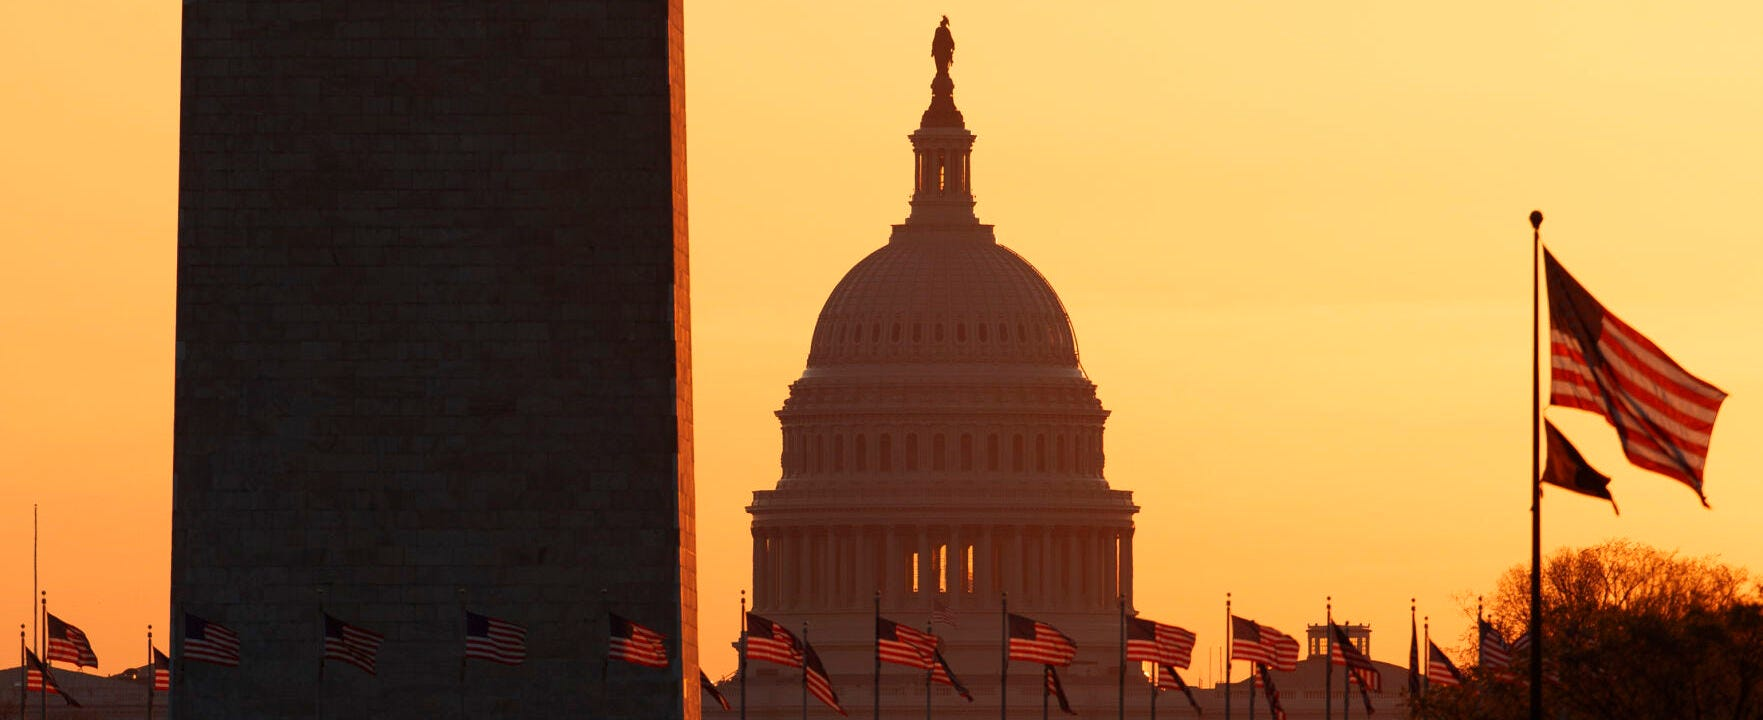 Should Congress approve more coronavirus stimulus?